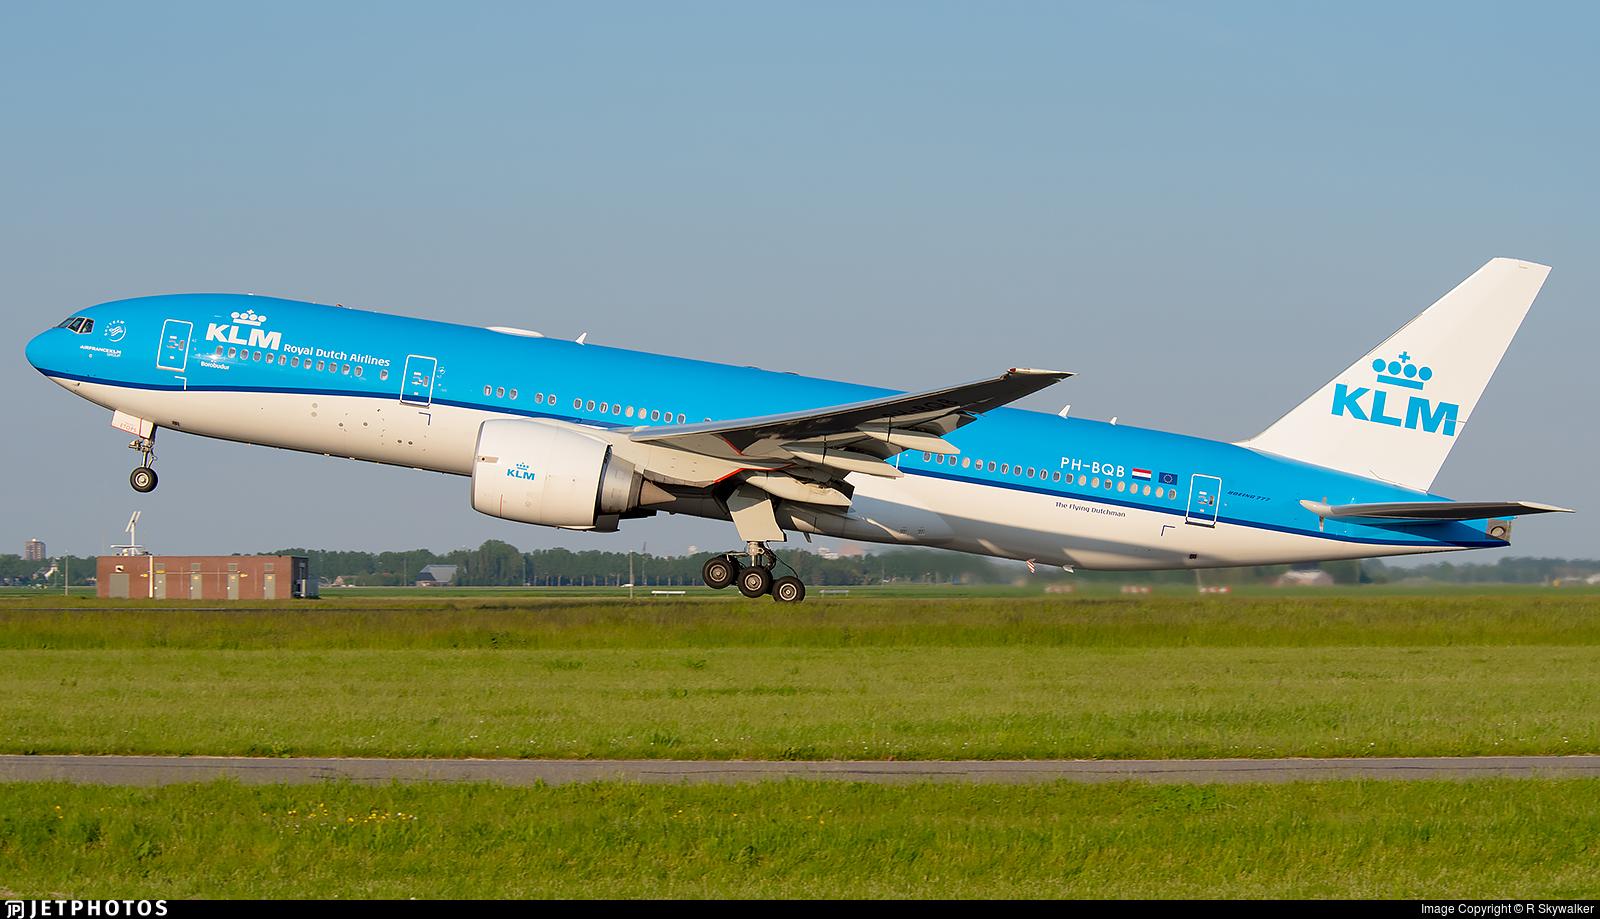 PH-BQB - Boeing 777-206(ER) - KLM Royal Dutch Airlines